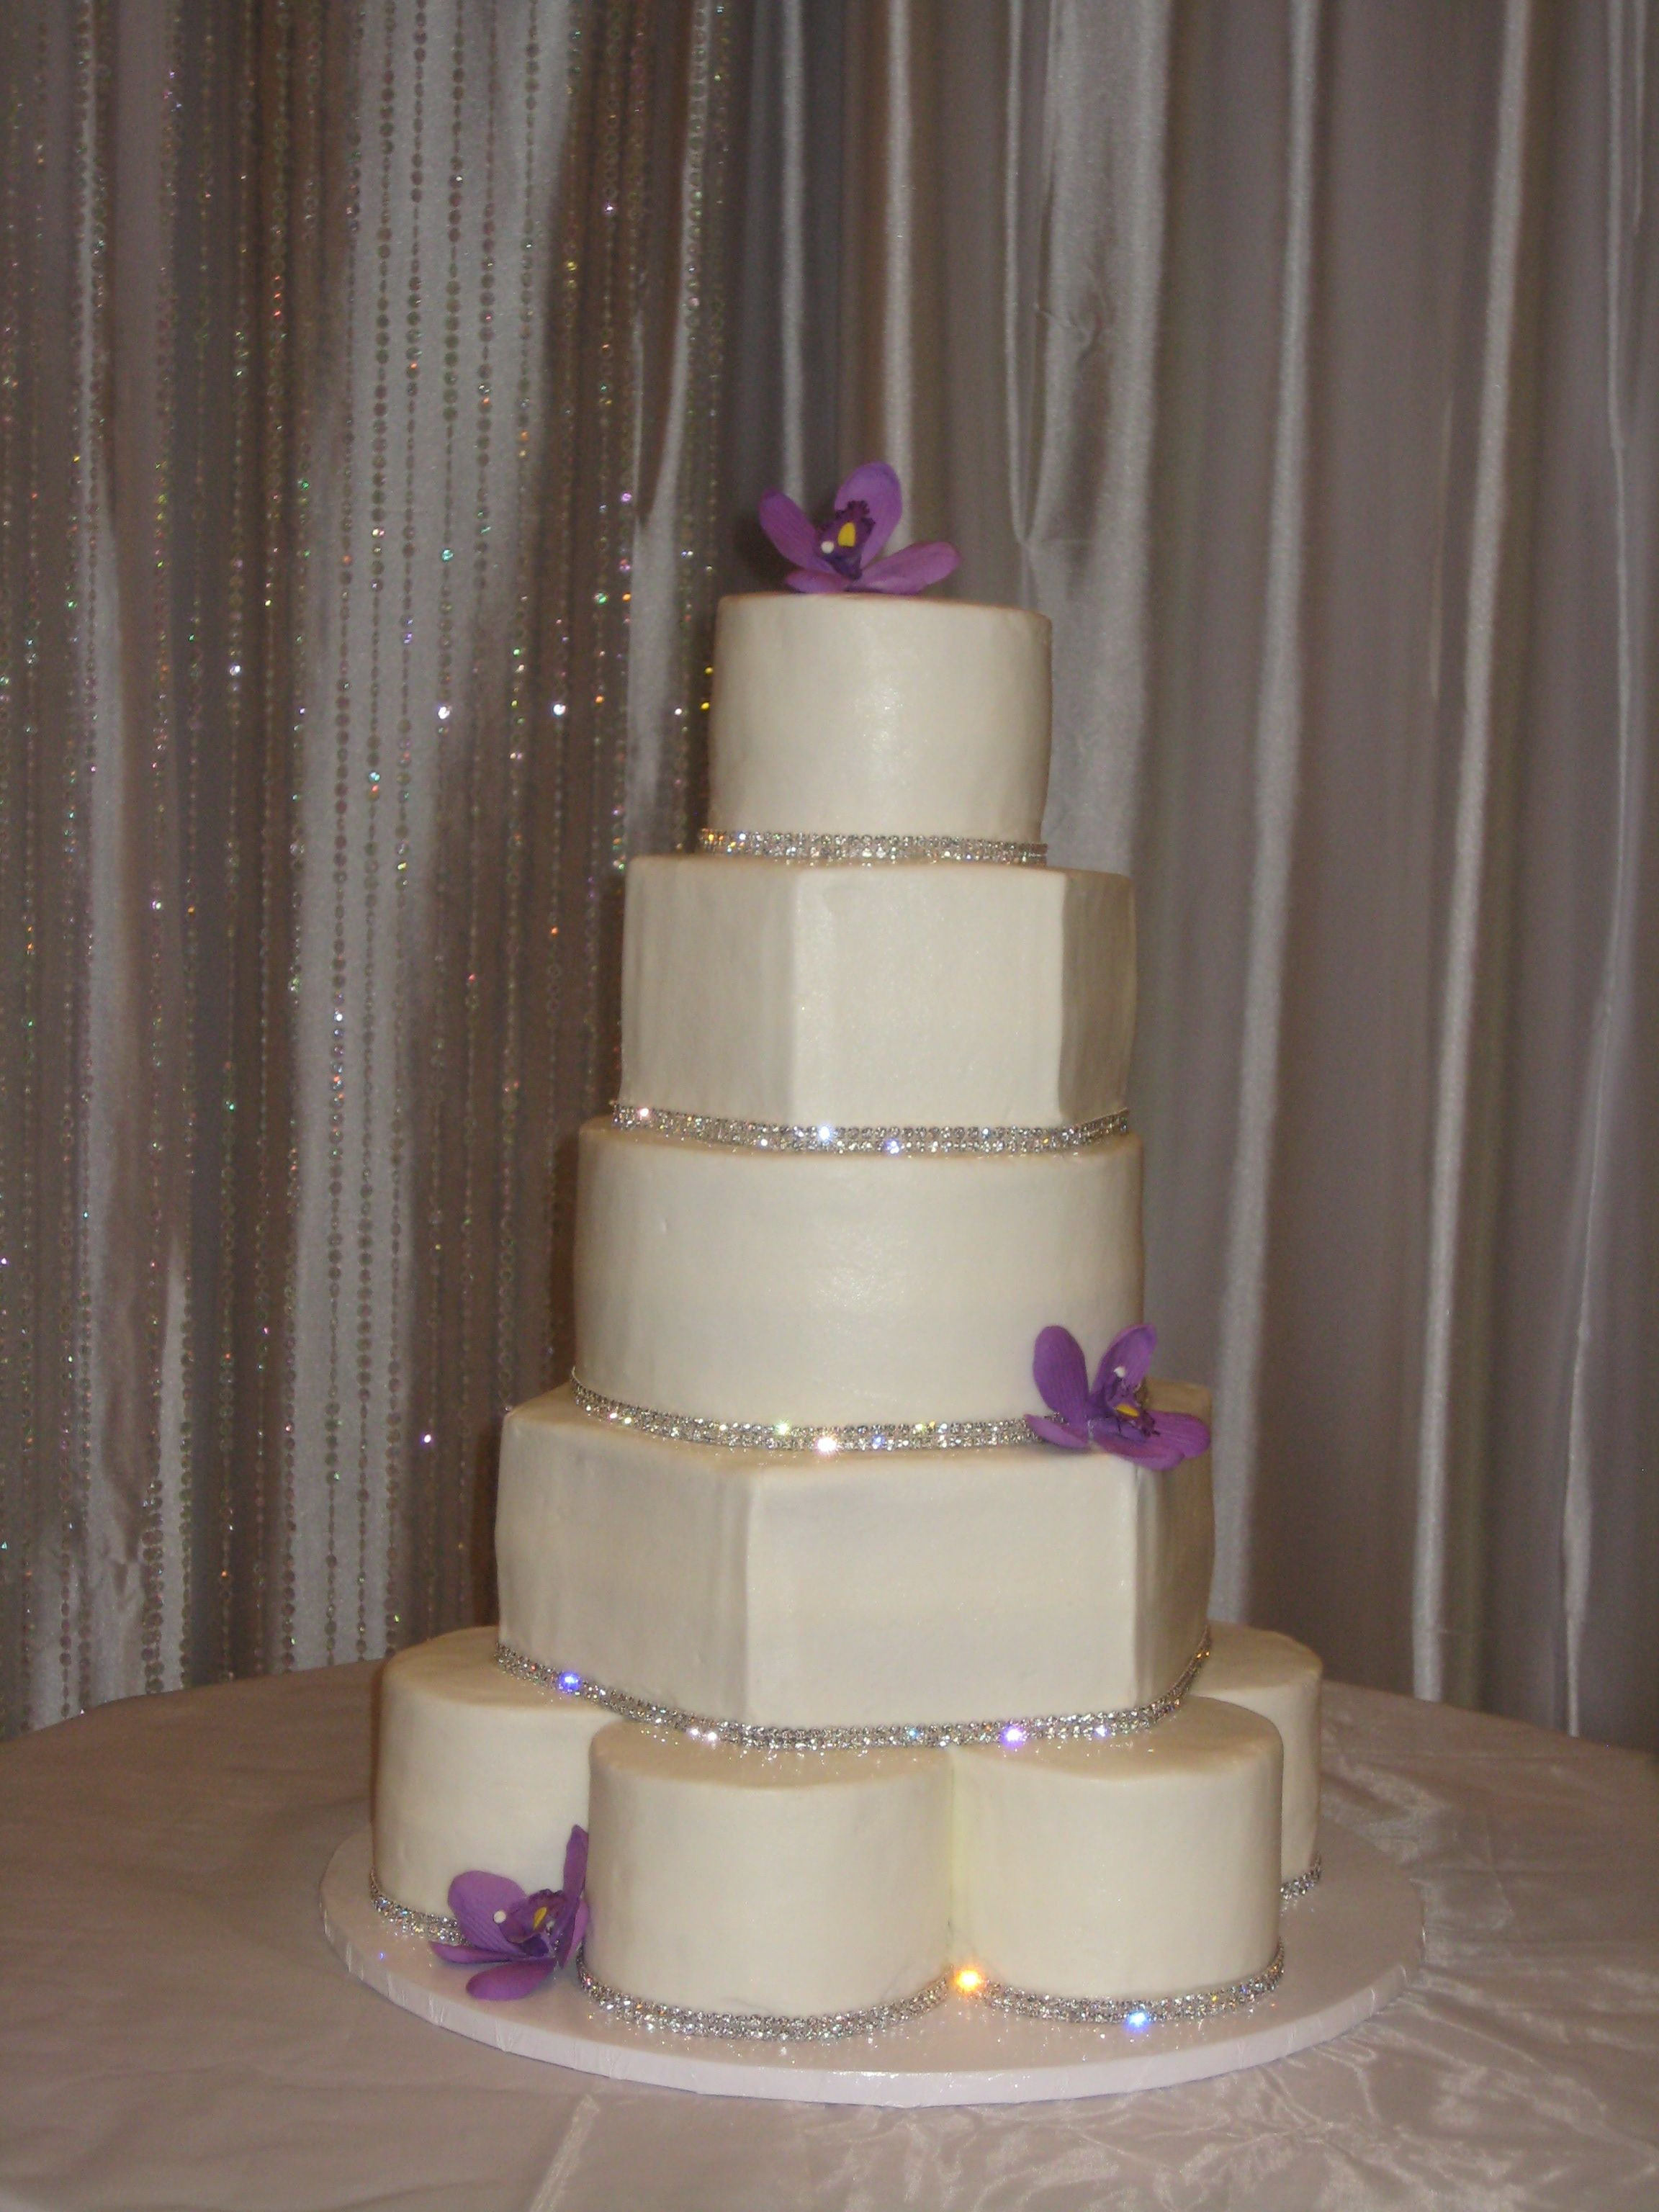 5 tier mixed shape wedding cake with rhinestones and sugar